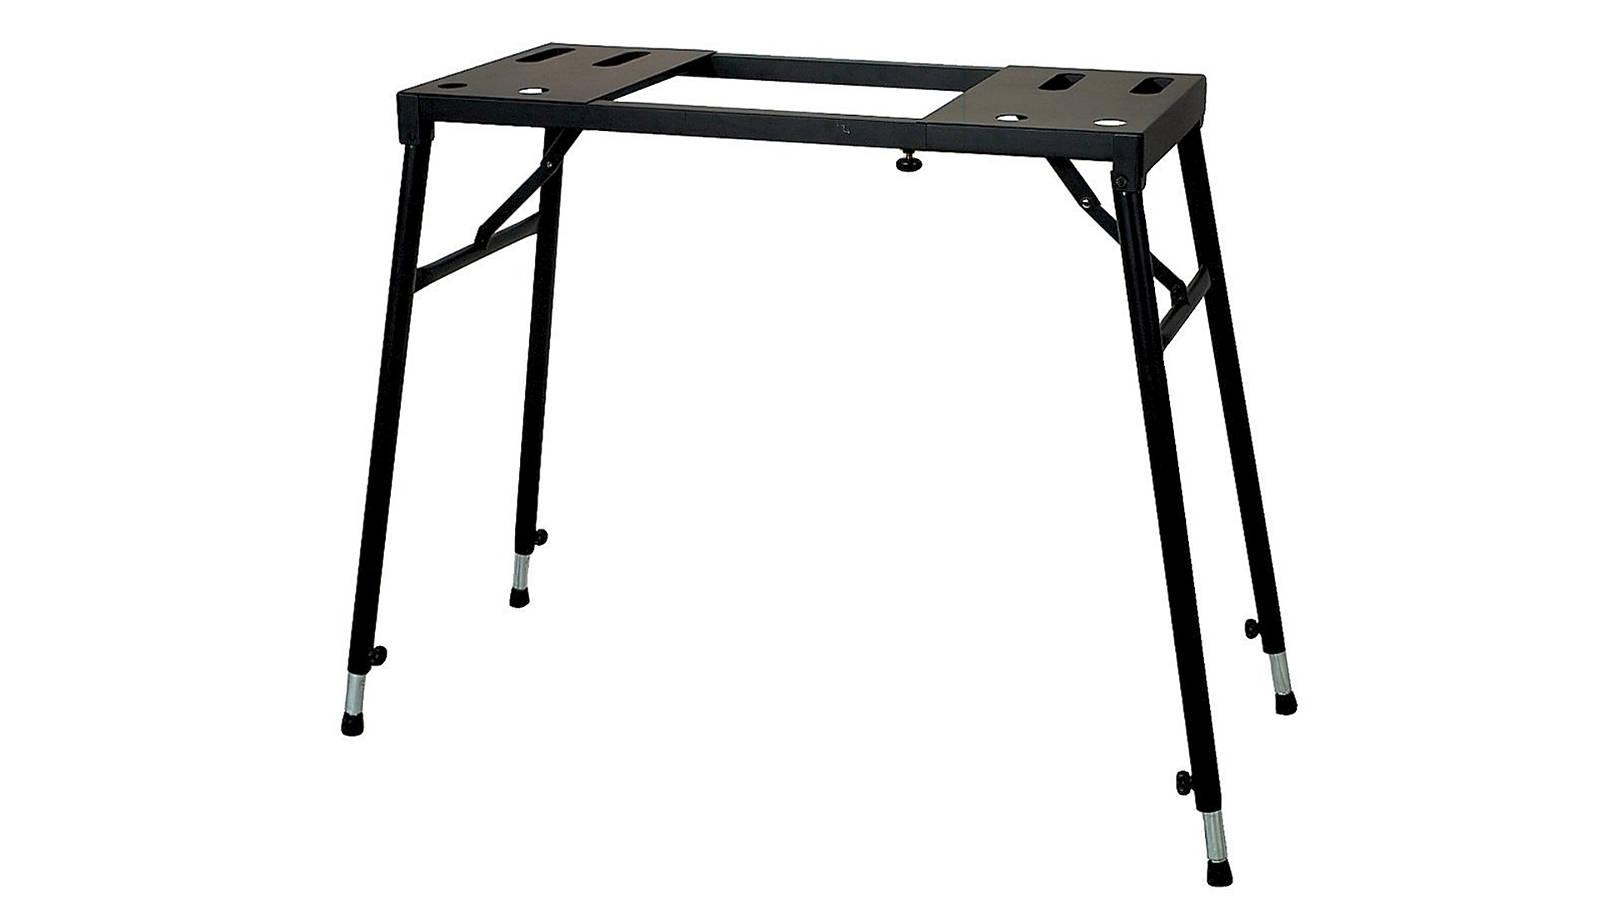 Basix Keyboardtisch